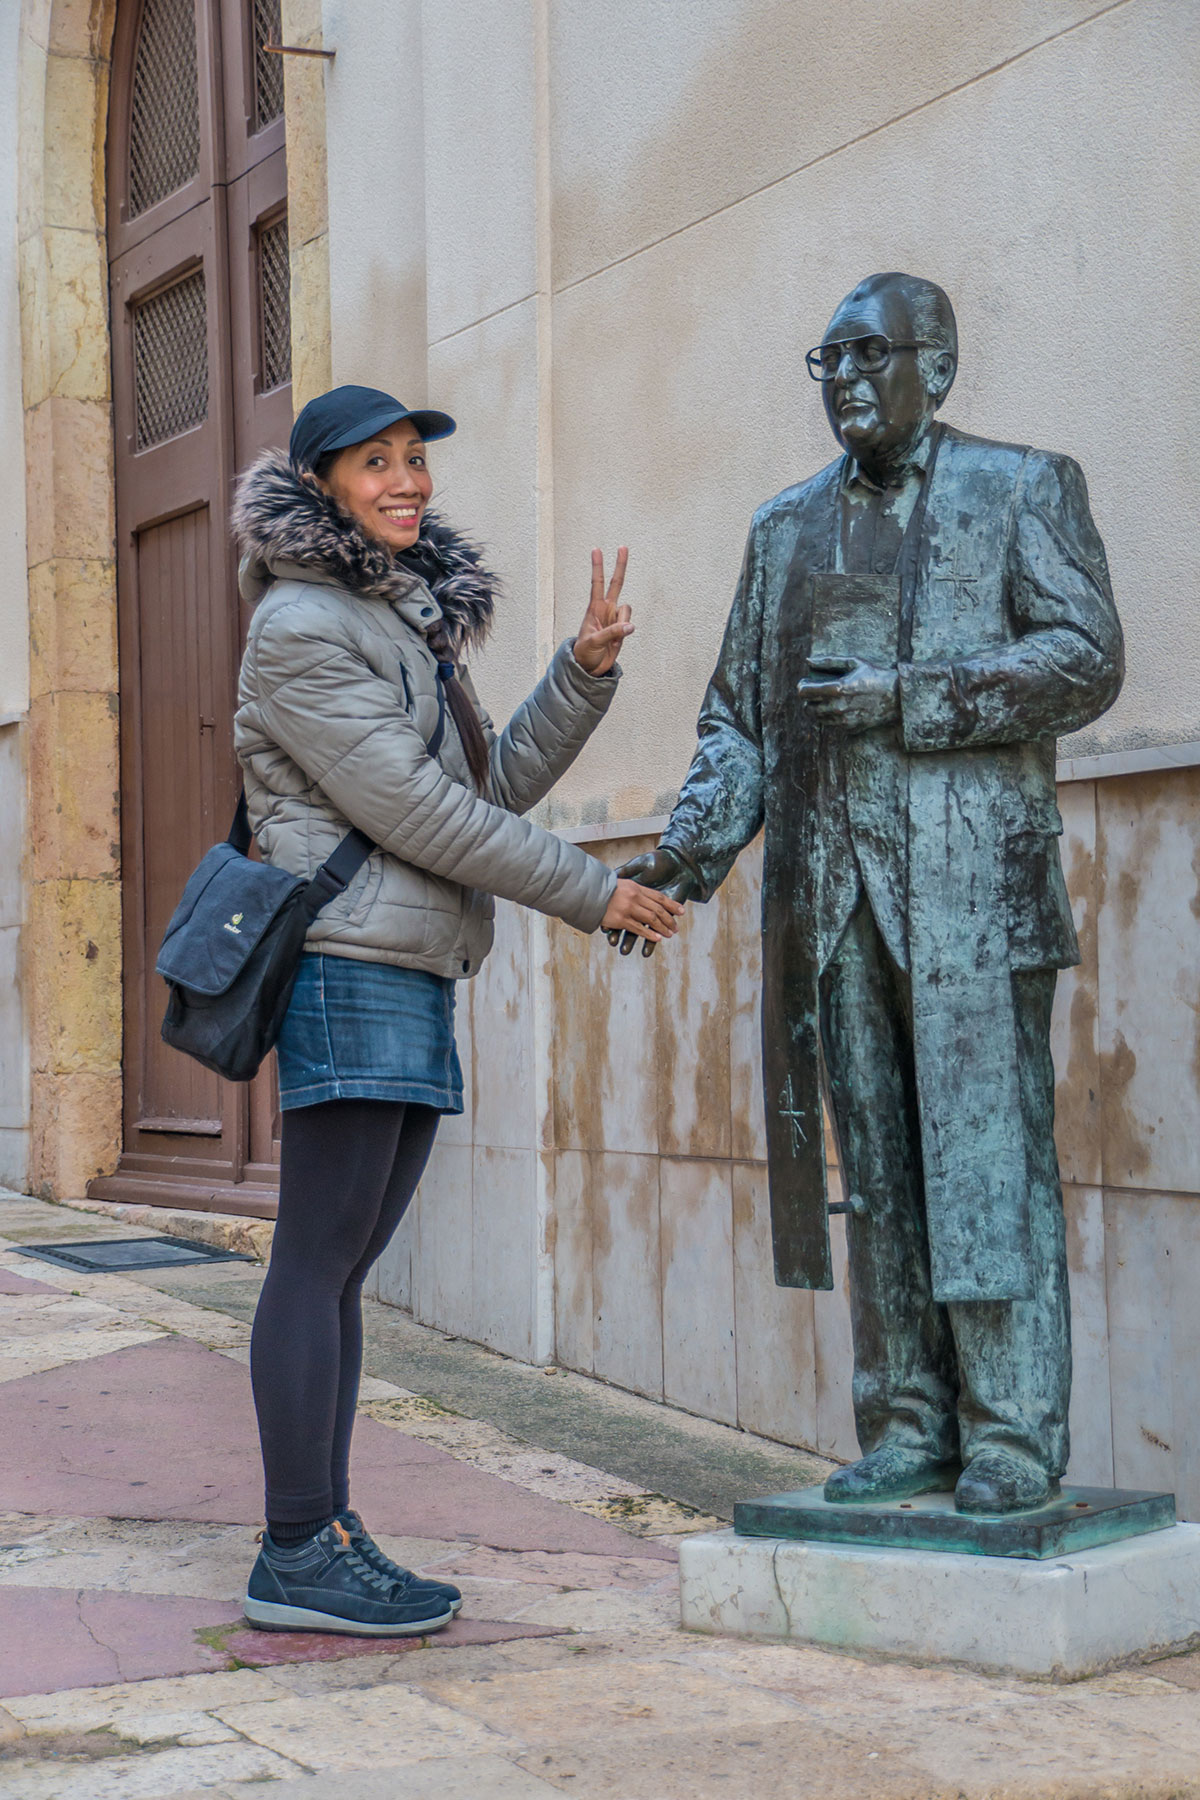 Spain, Catalonia, Tarragona, statue shaking hands